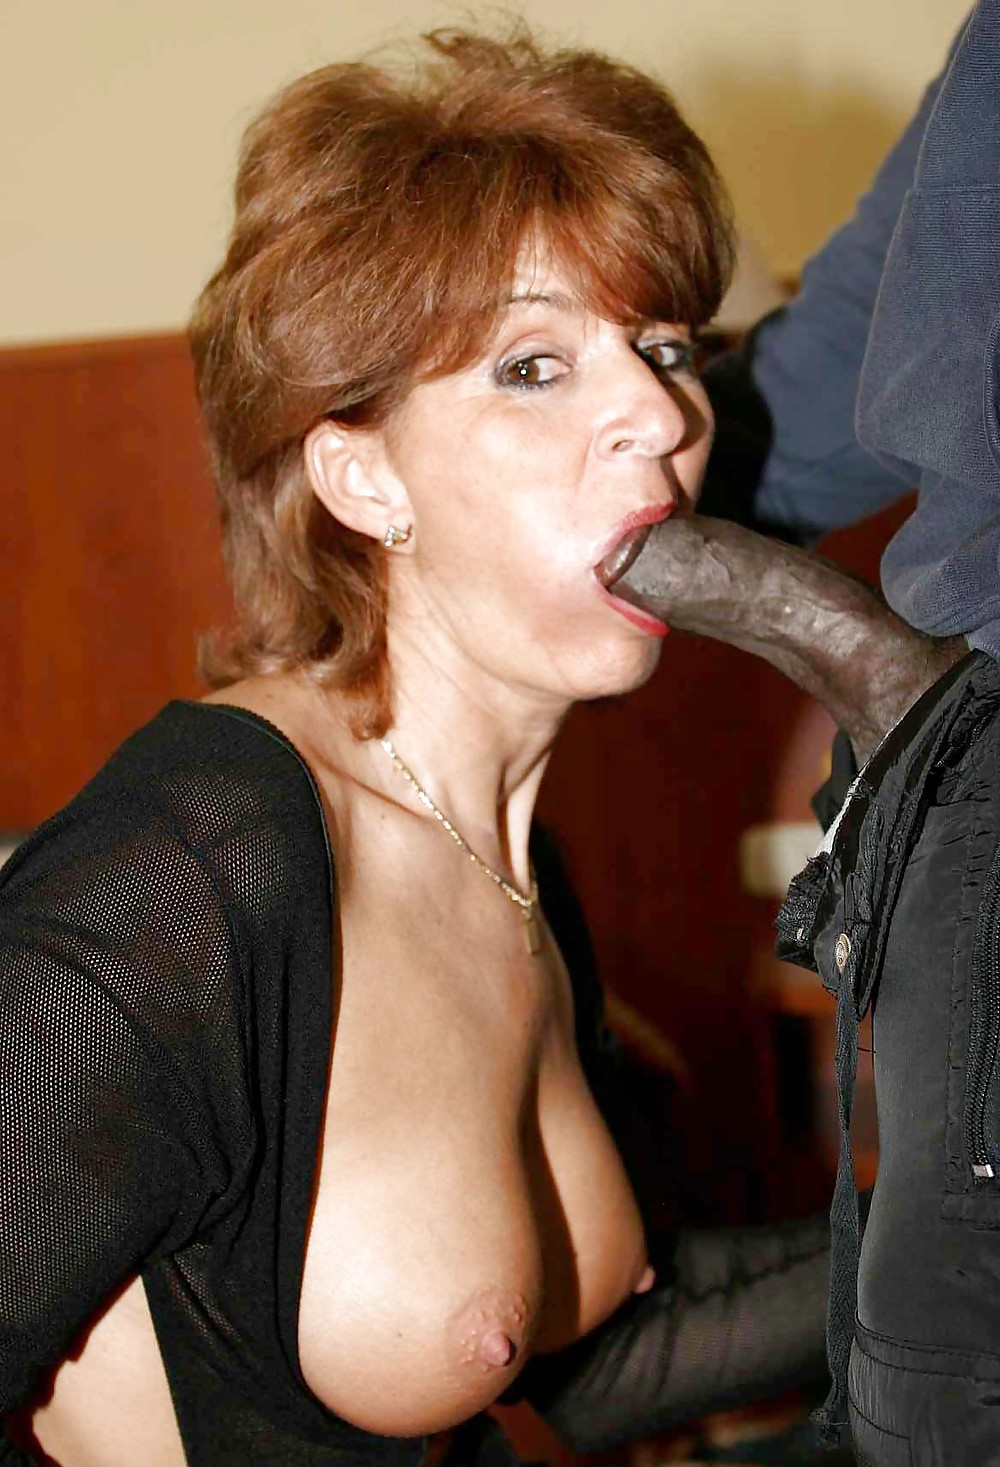 mature-ladies-huge-cock-tubes-forced-bareback-fuck